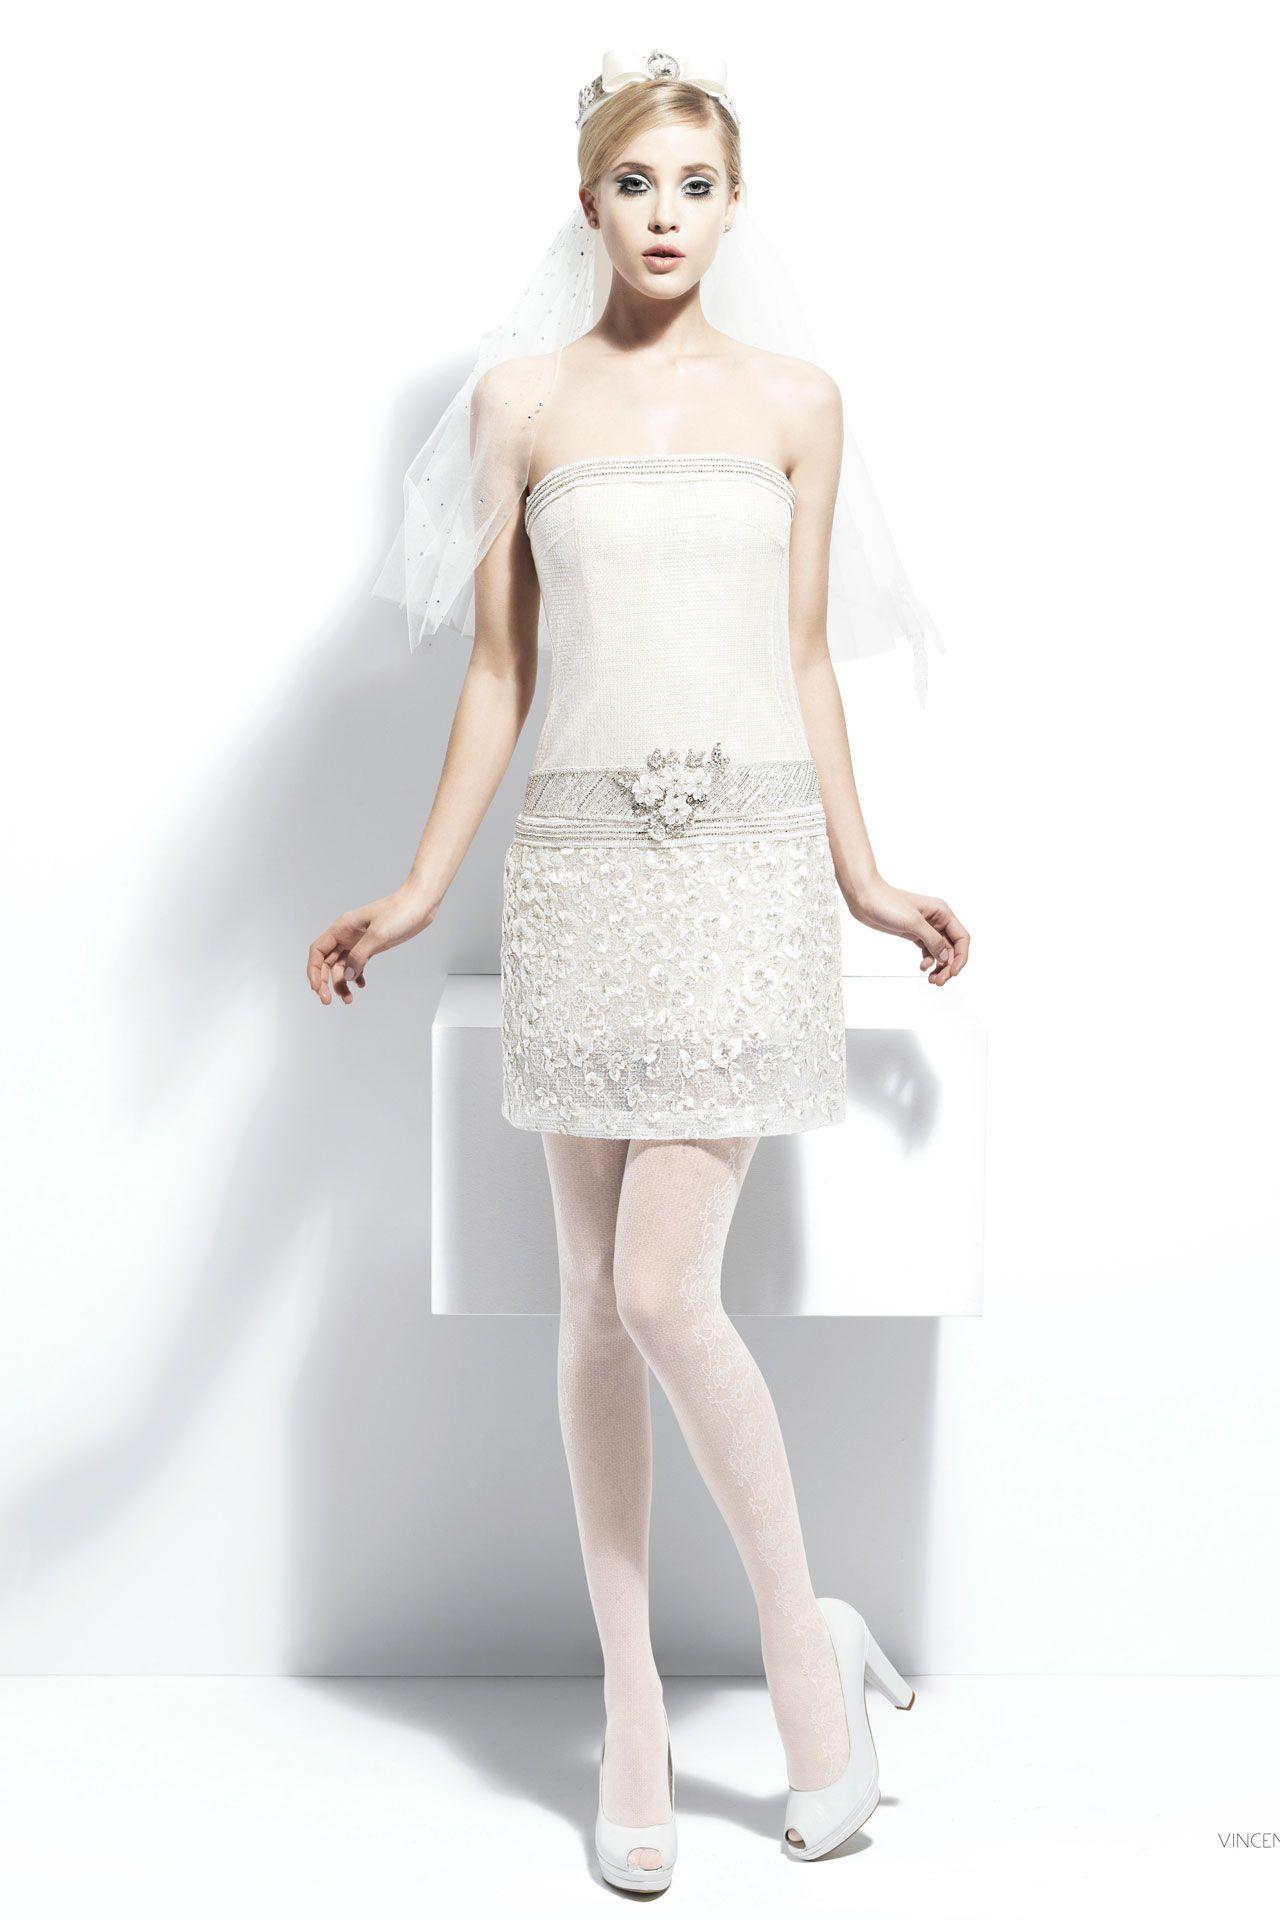 Best vintage wedding dress designers  Wedding Dresses  The Ultimate Gallery BridesMagazine